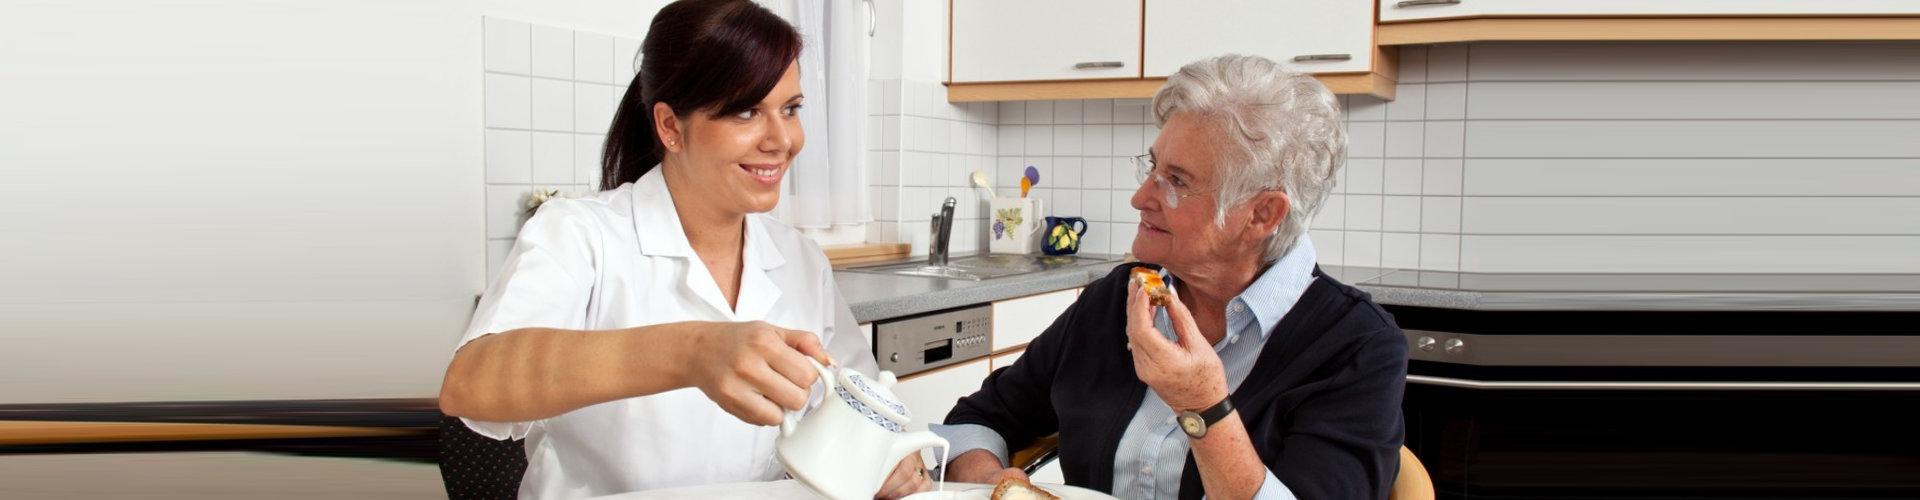 caregiver and senior woman eating